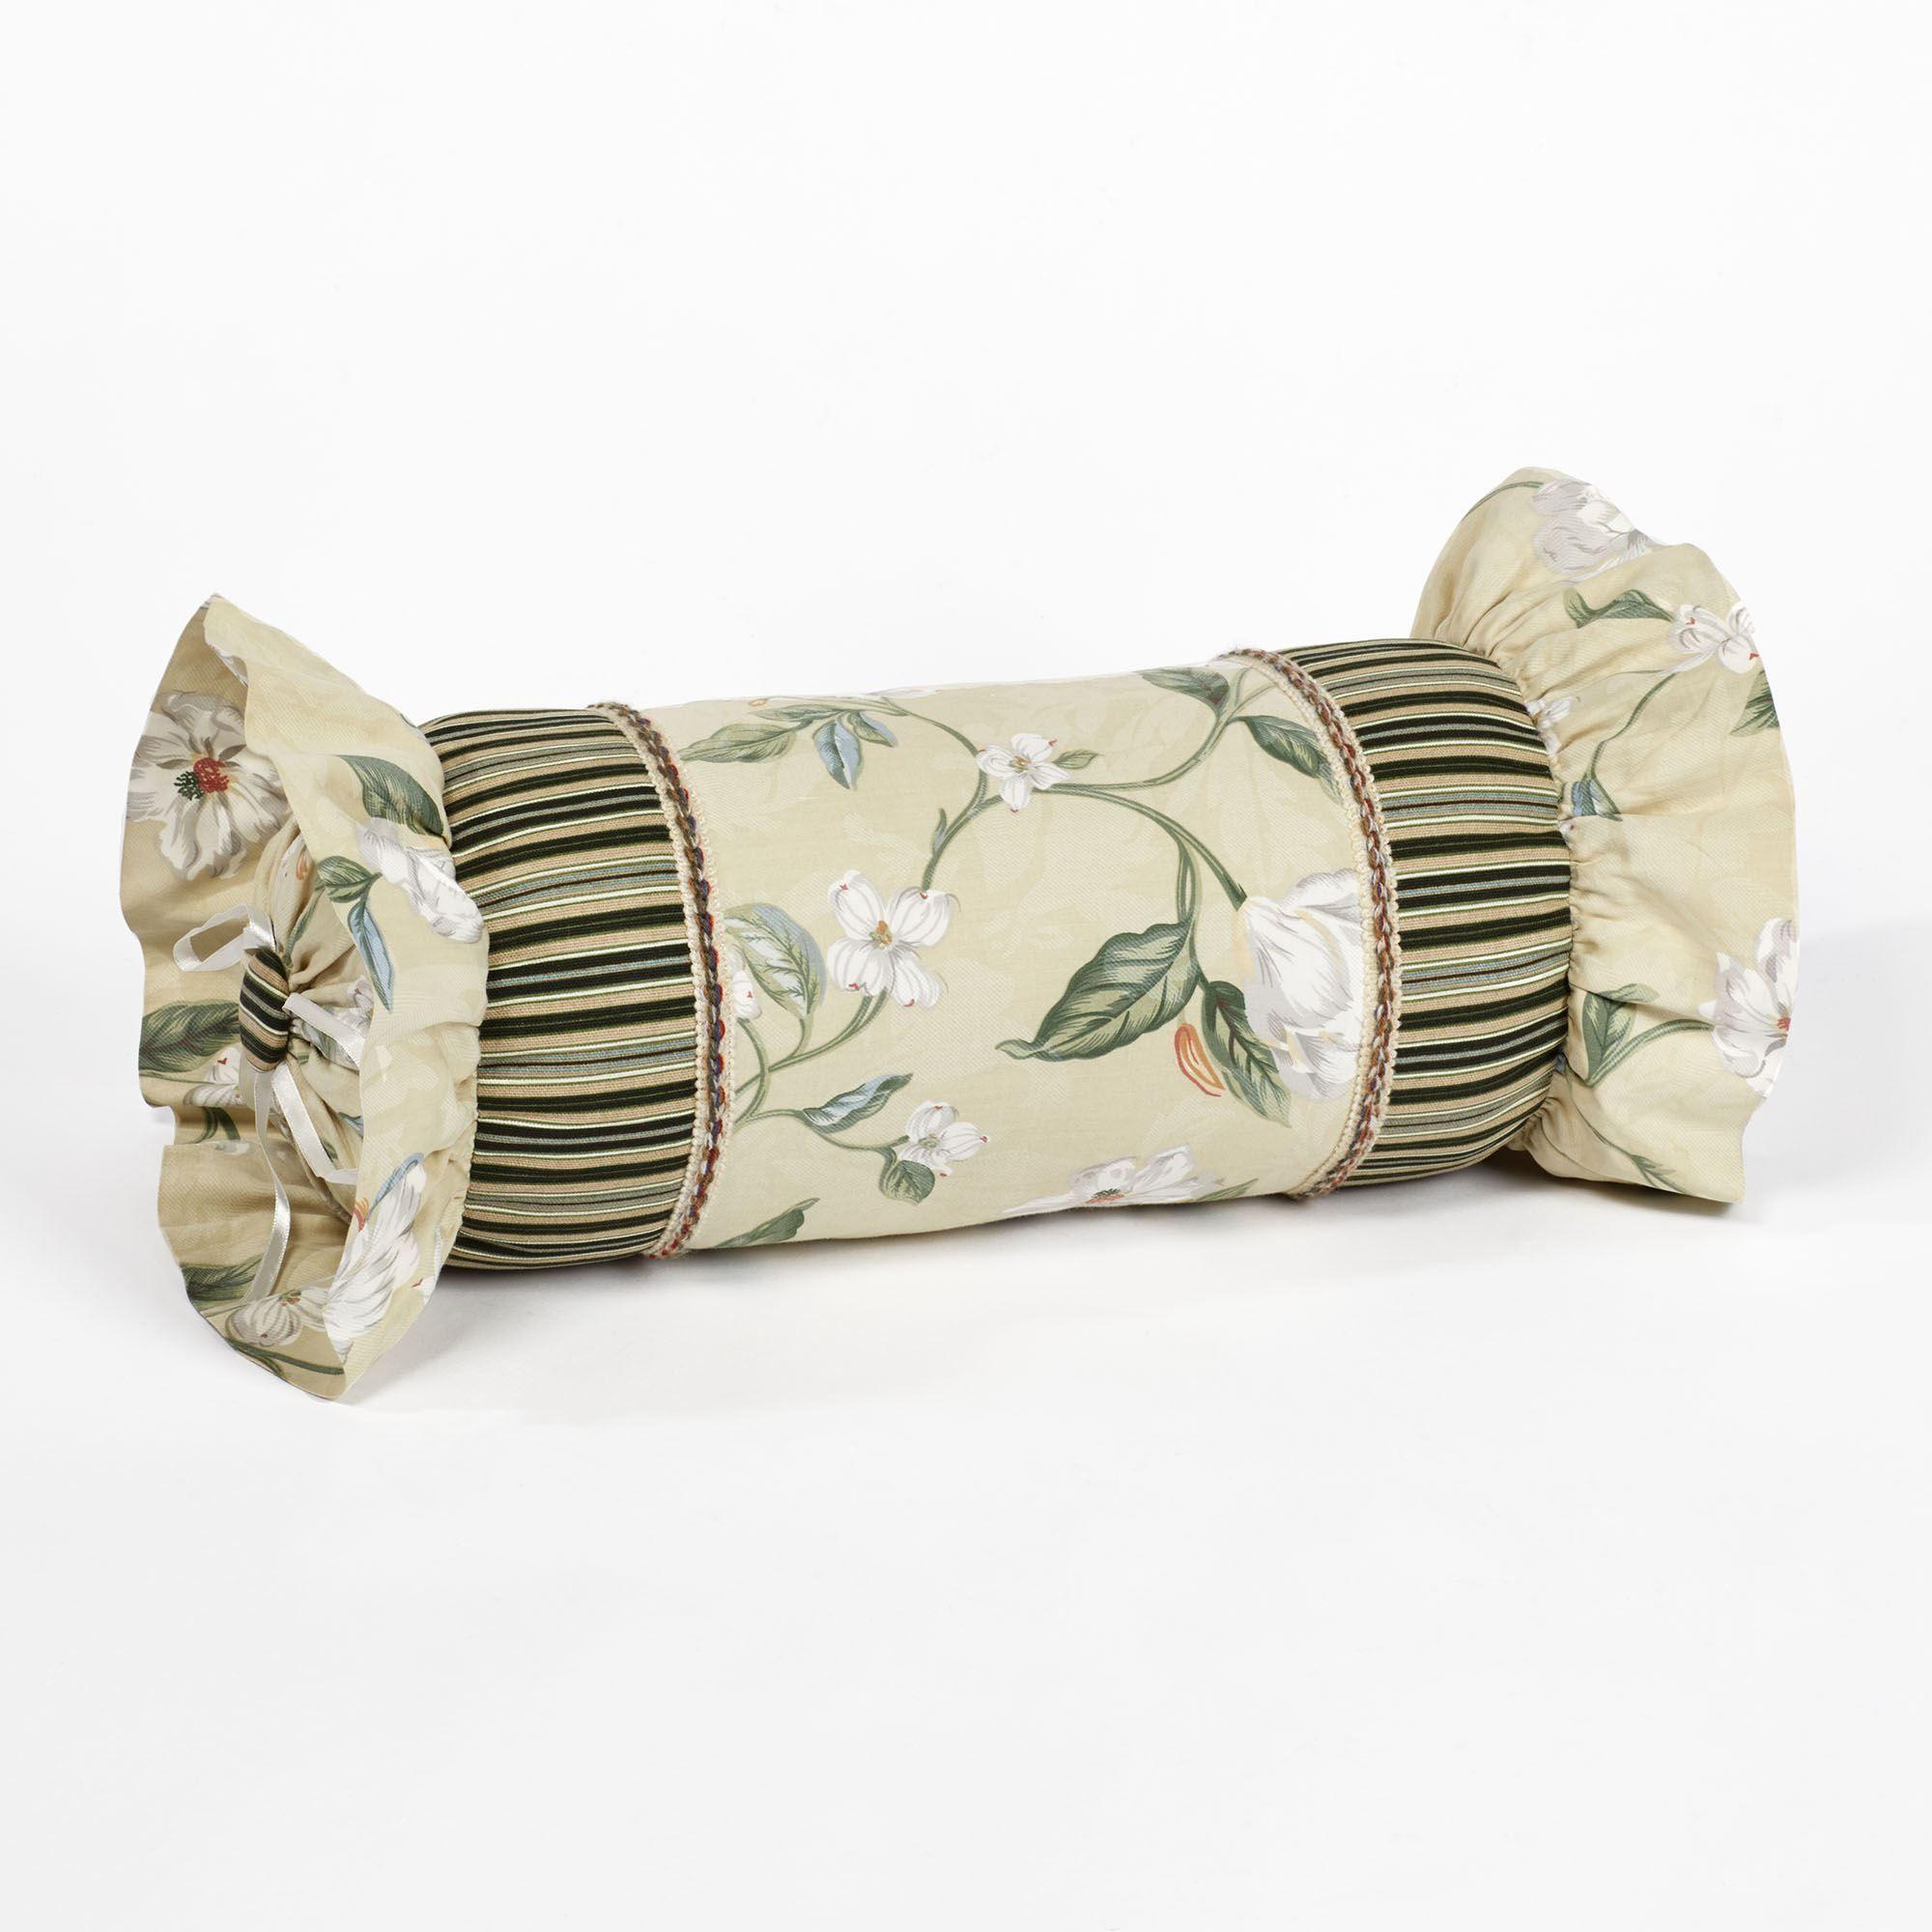 Garden Images III Neckroll Pillow Parchment